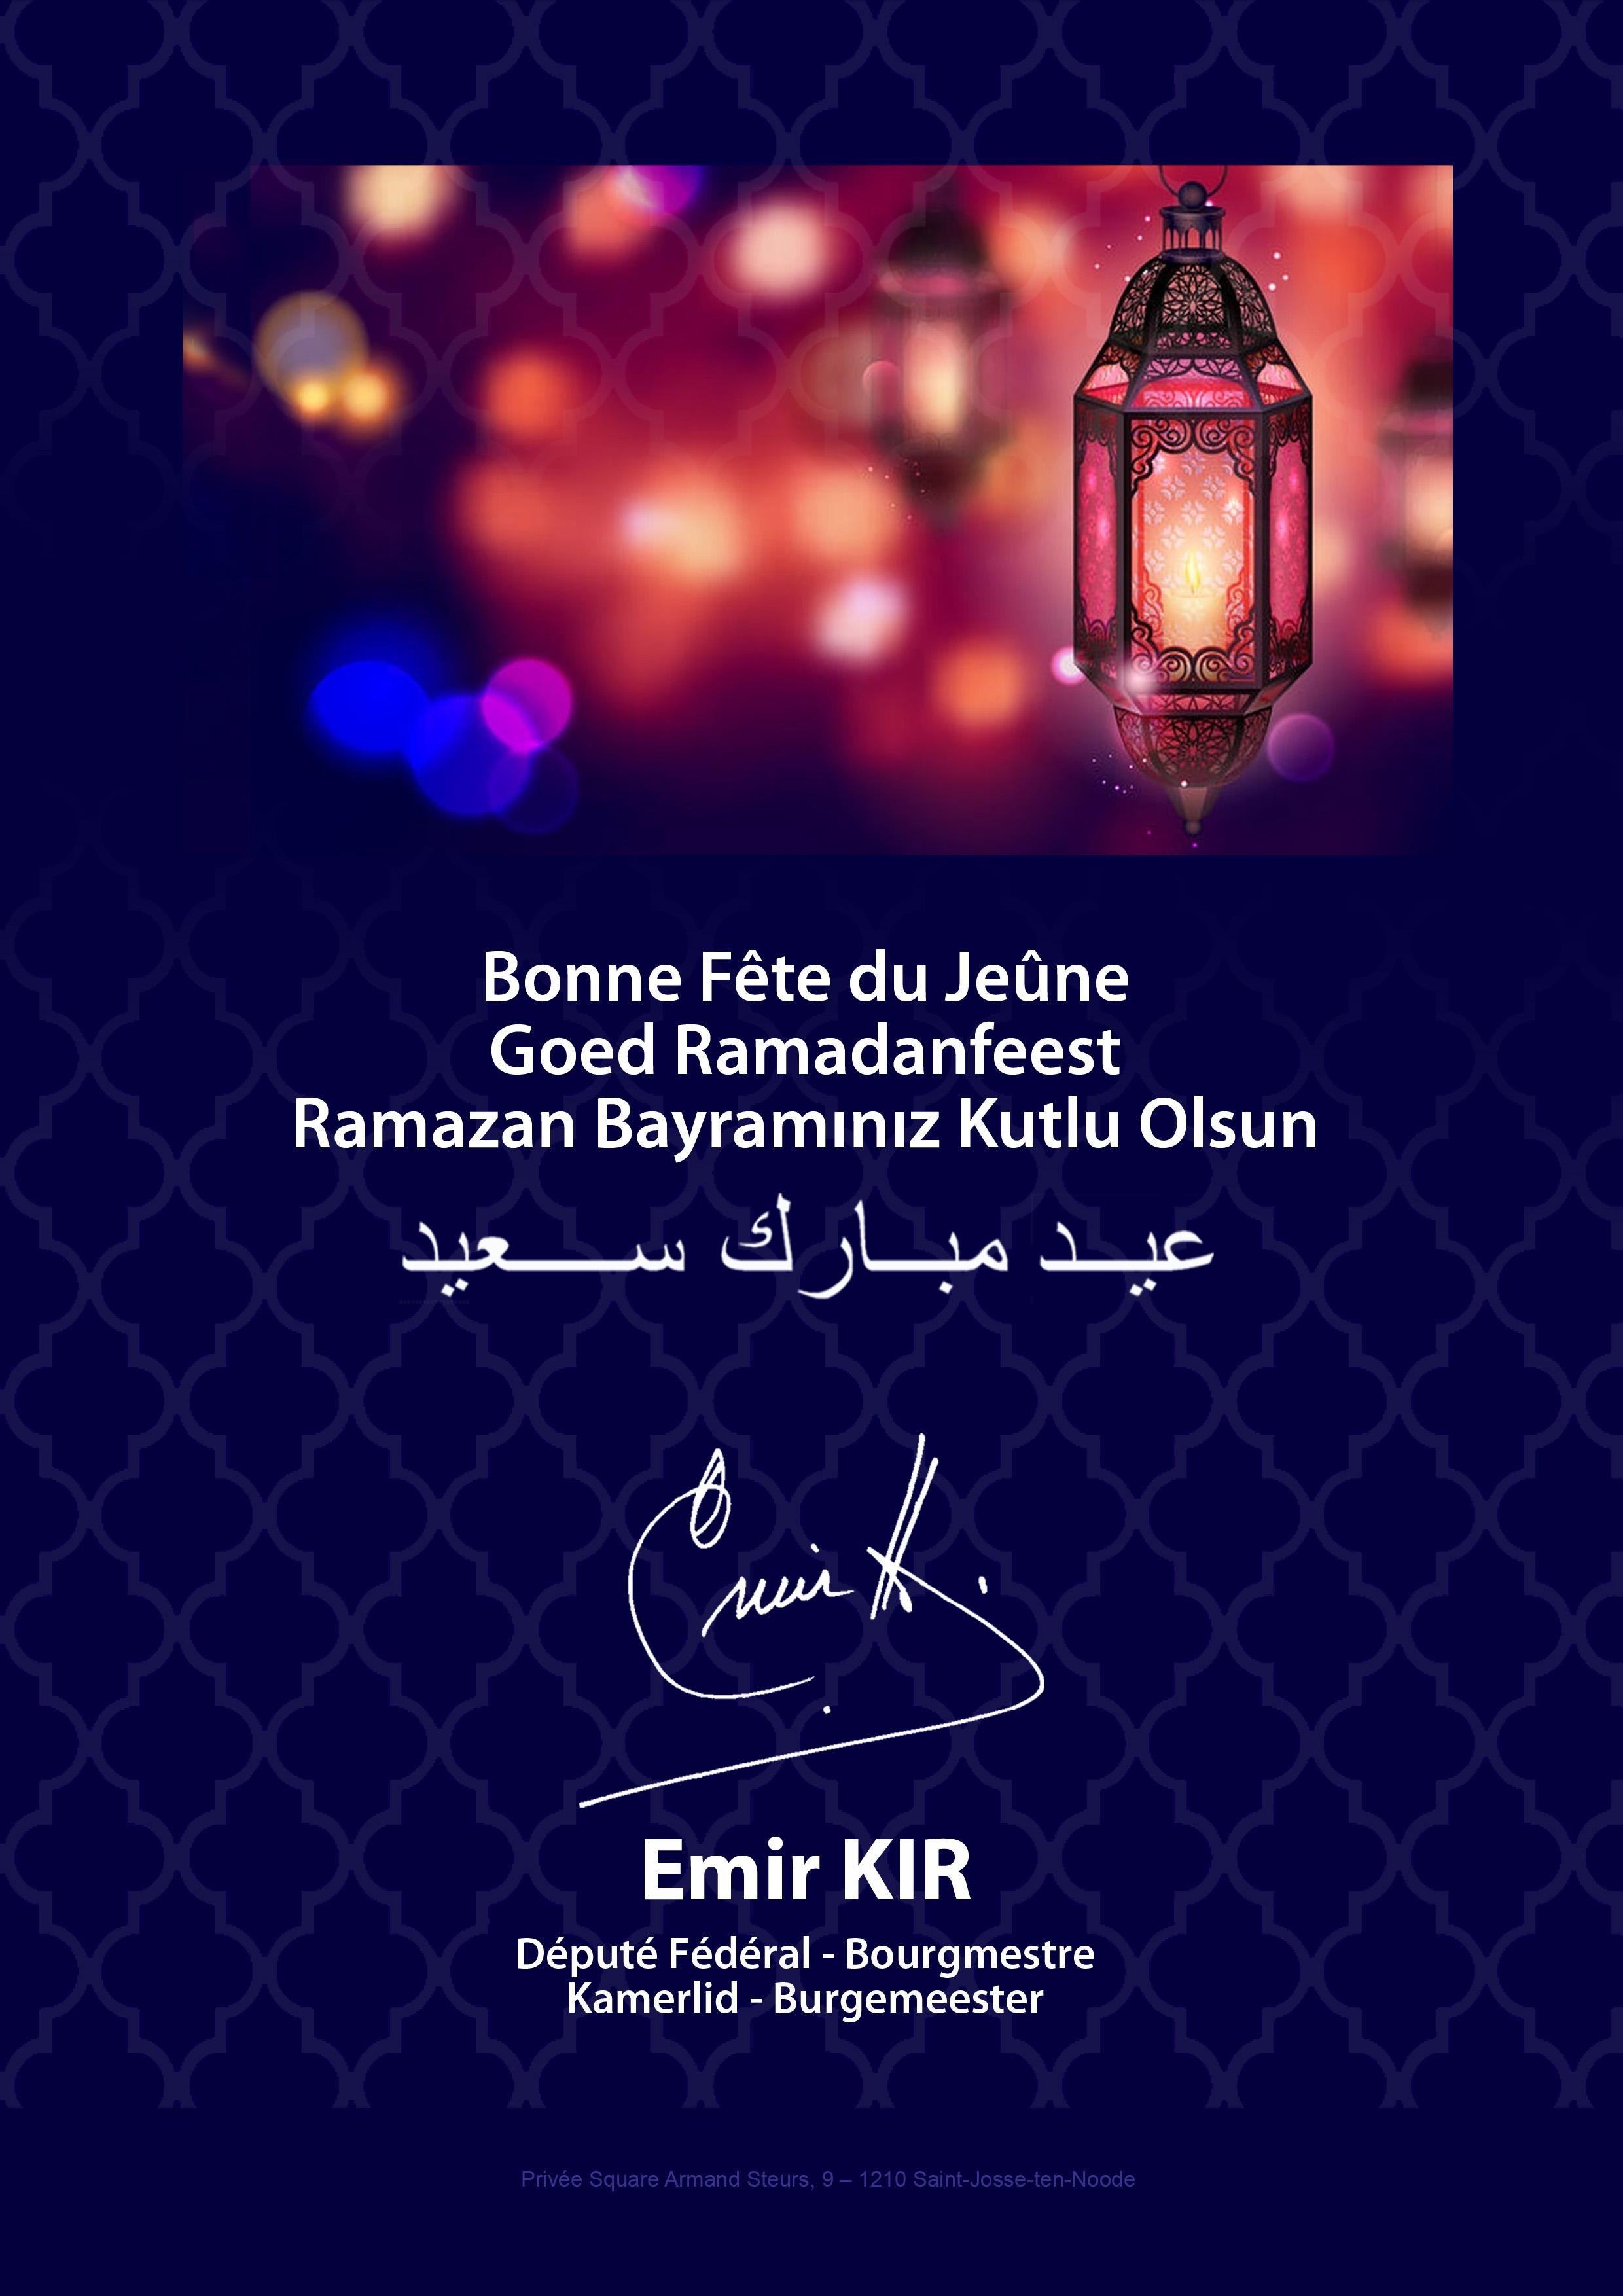 http://www.aktif.be/wp-content/uploads/2017/06/A4-Ramadan-2017.jpg